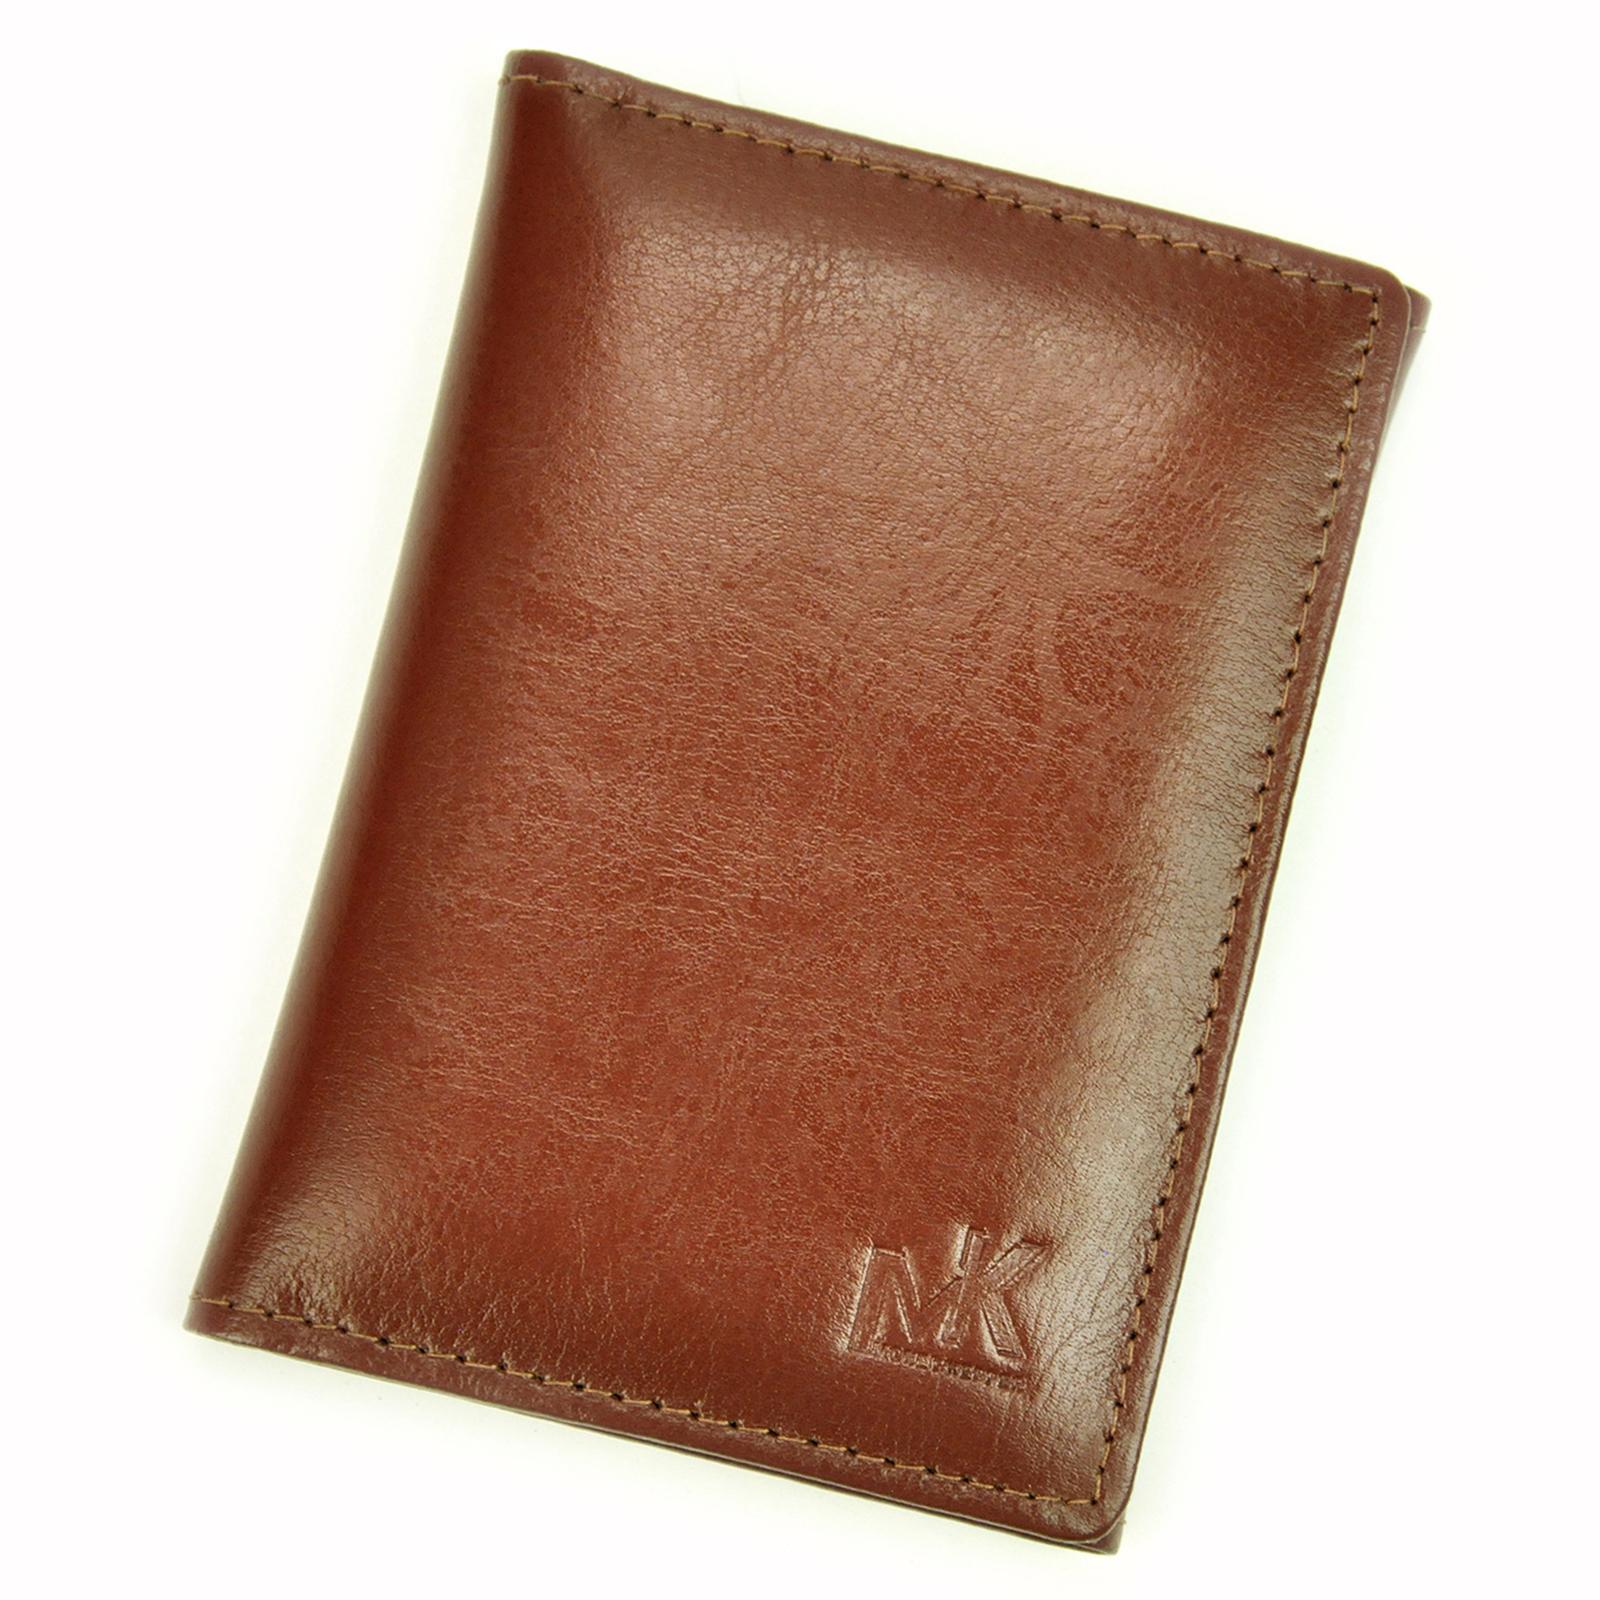 Puzdro na doklady Money Kepper R7001